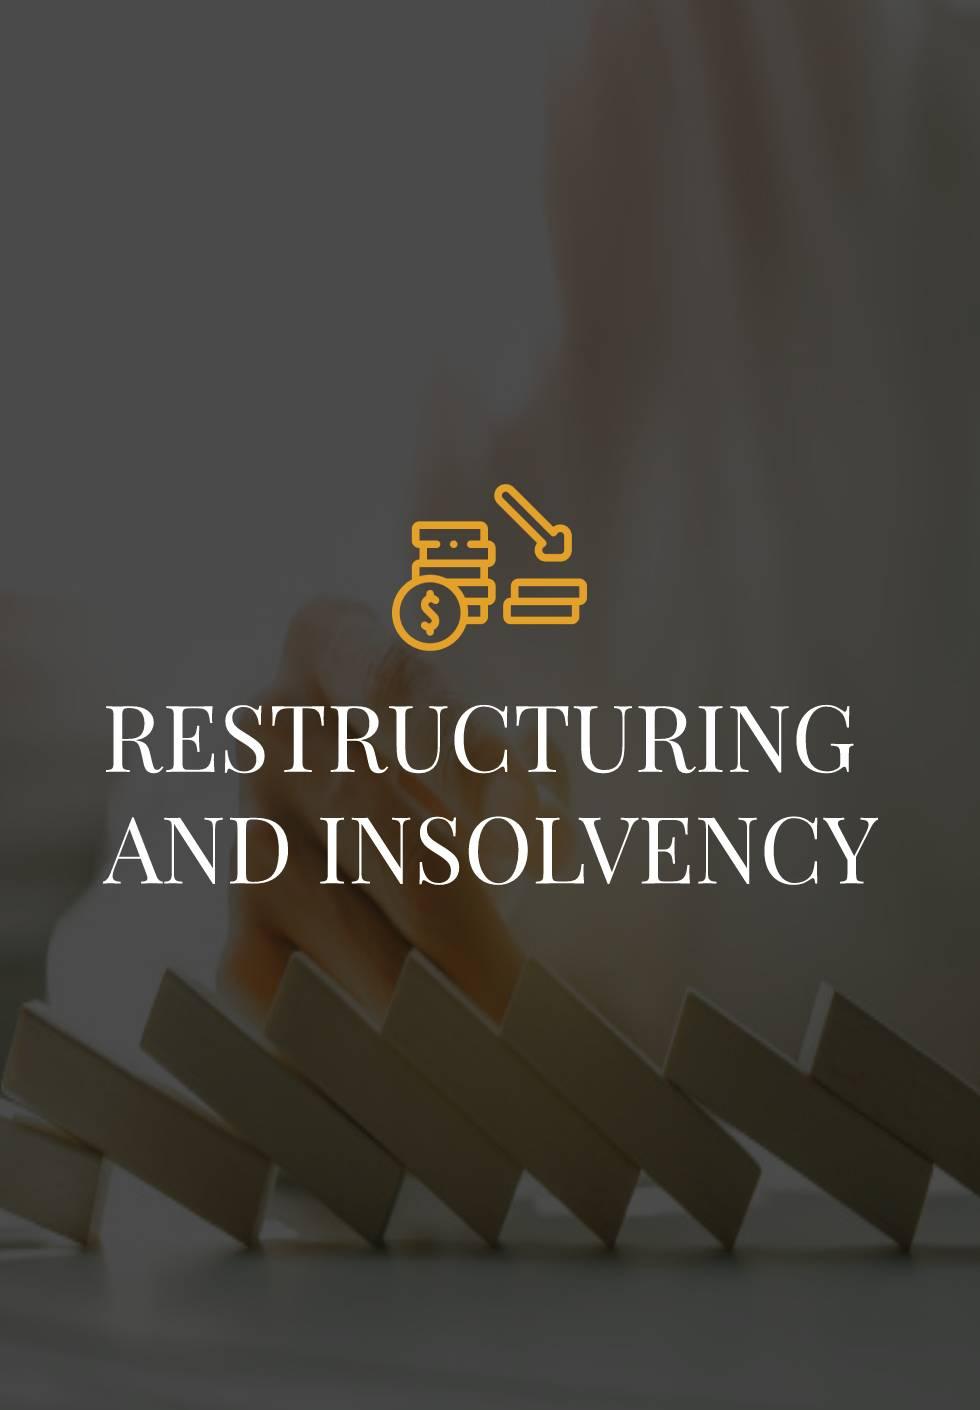 prepared insolvnecy